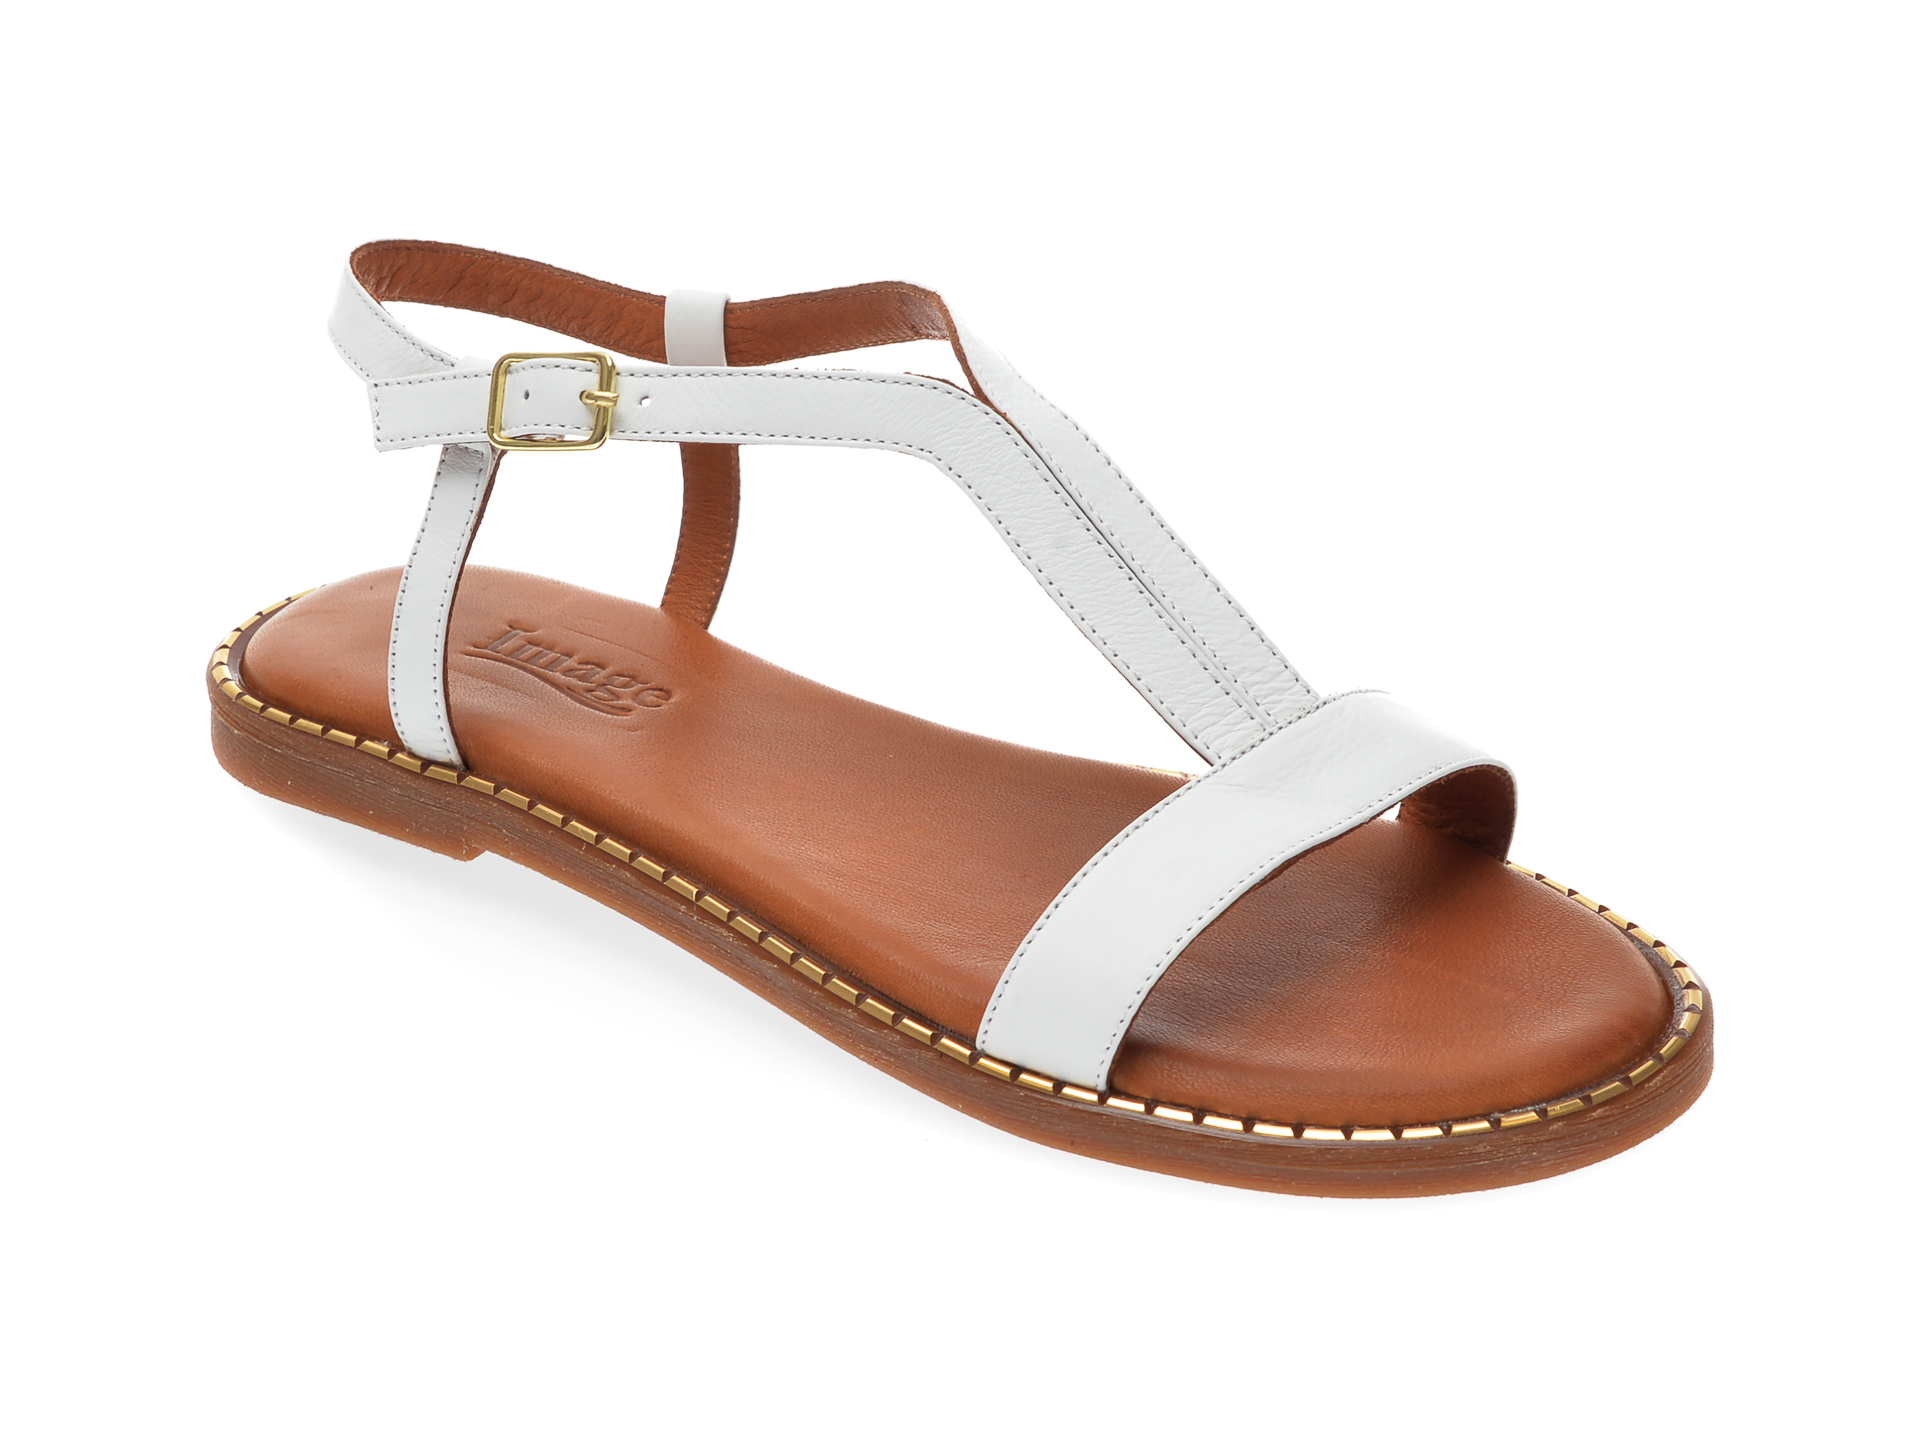 Sandale IMAGE albe, 701, din piele naturala imagine otter.ro 2021